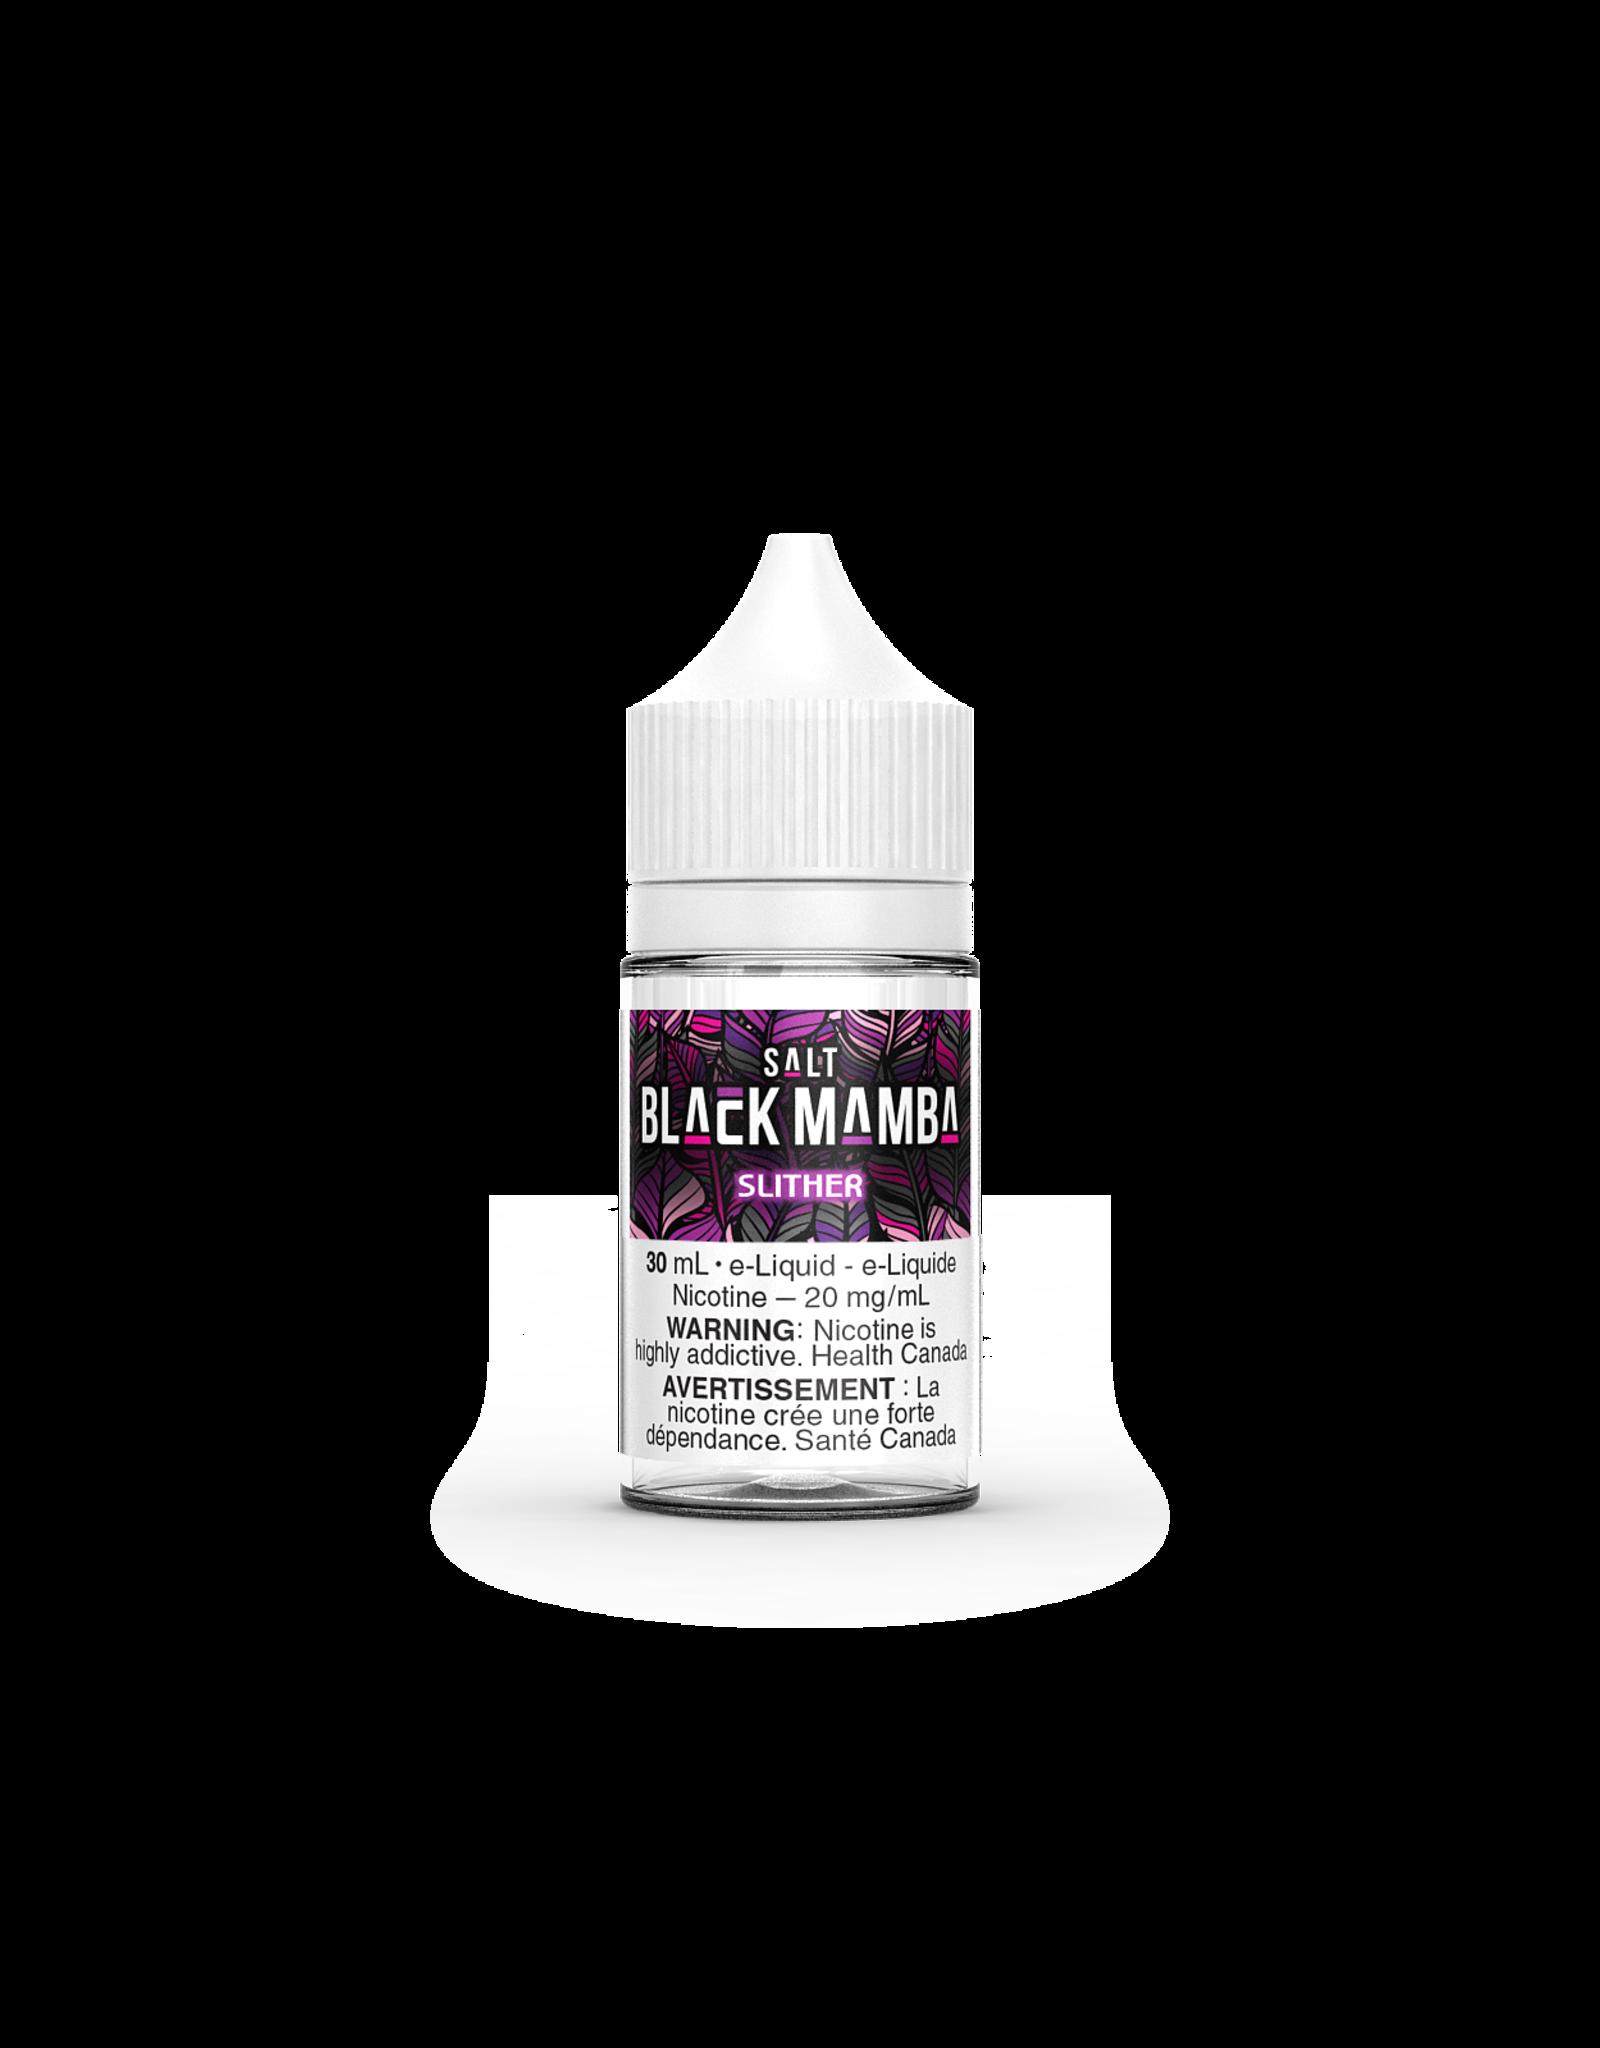 Black Mamba Salt